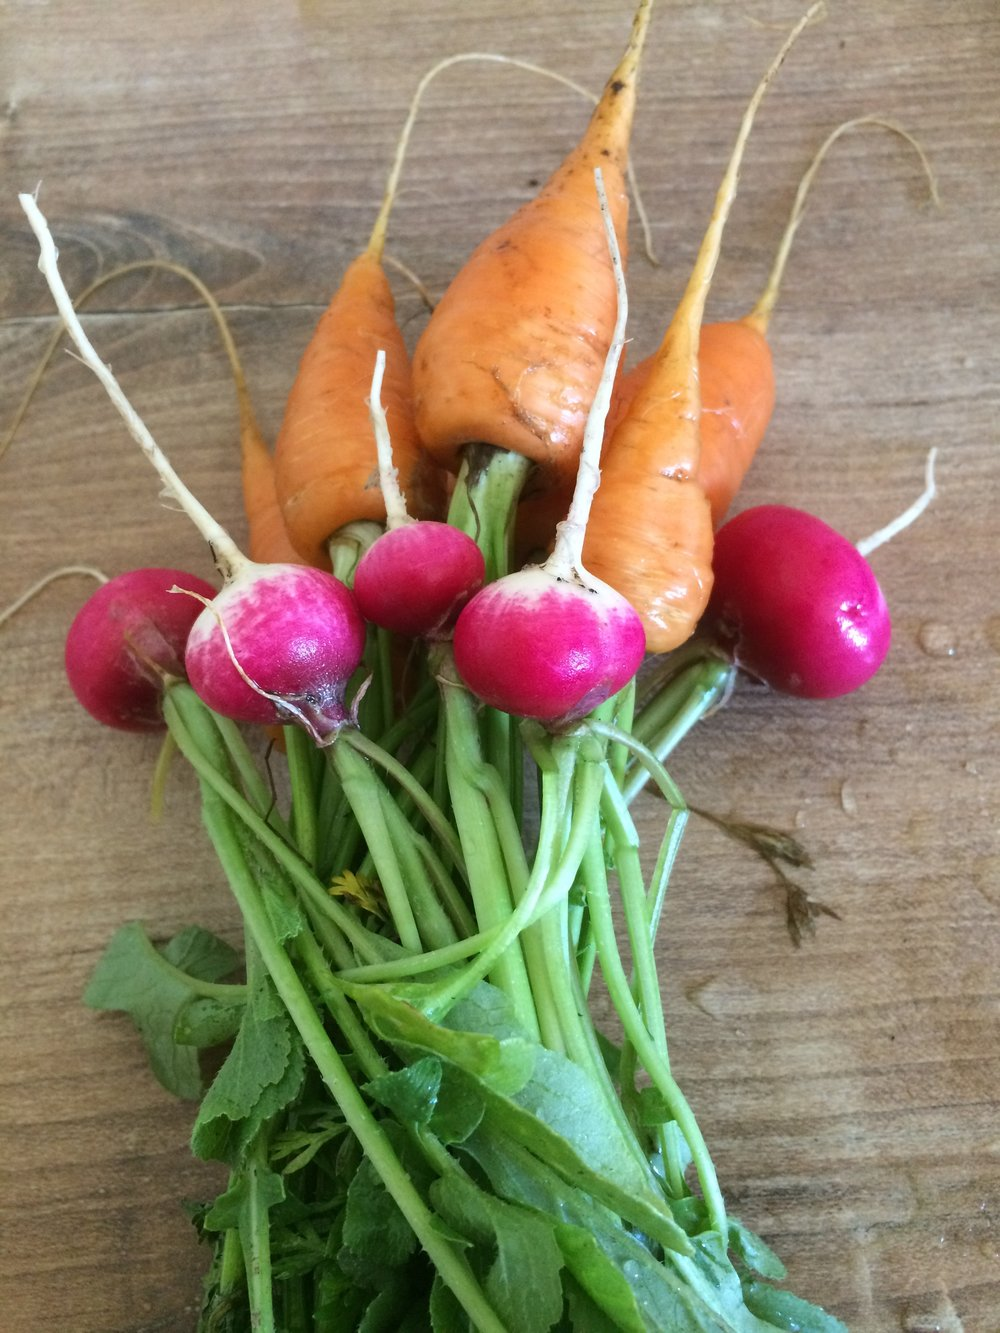 carotte et radis.JPG